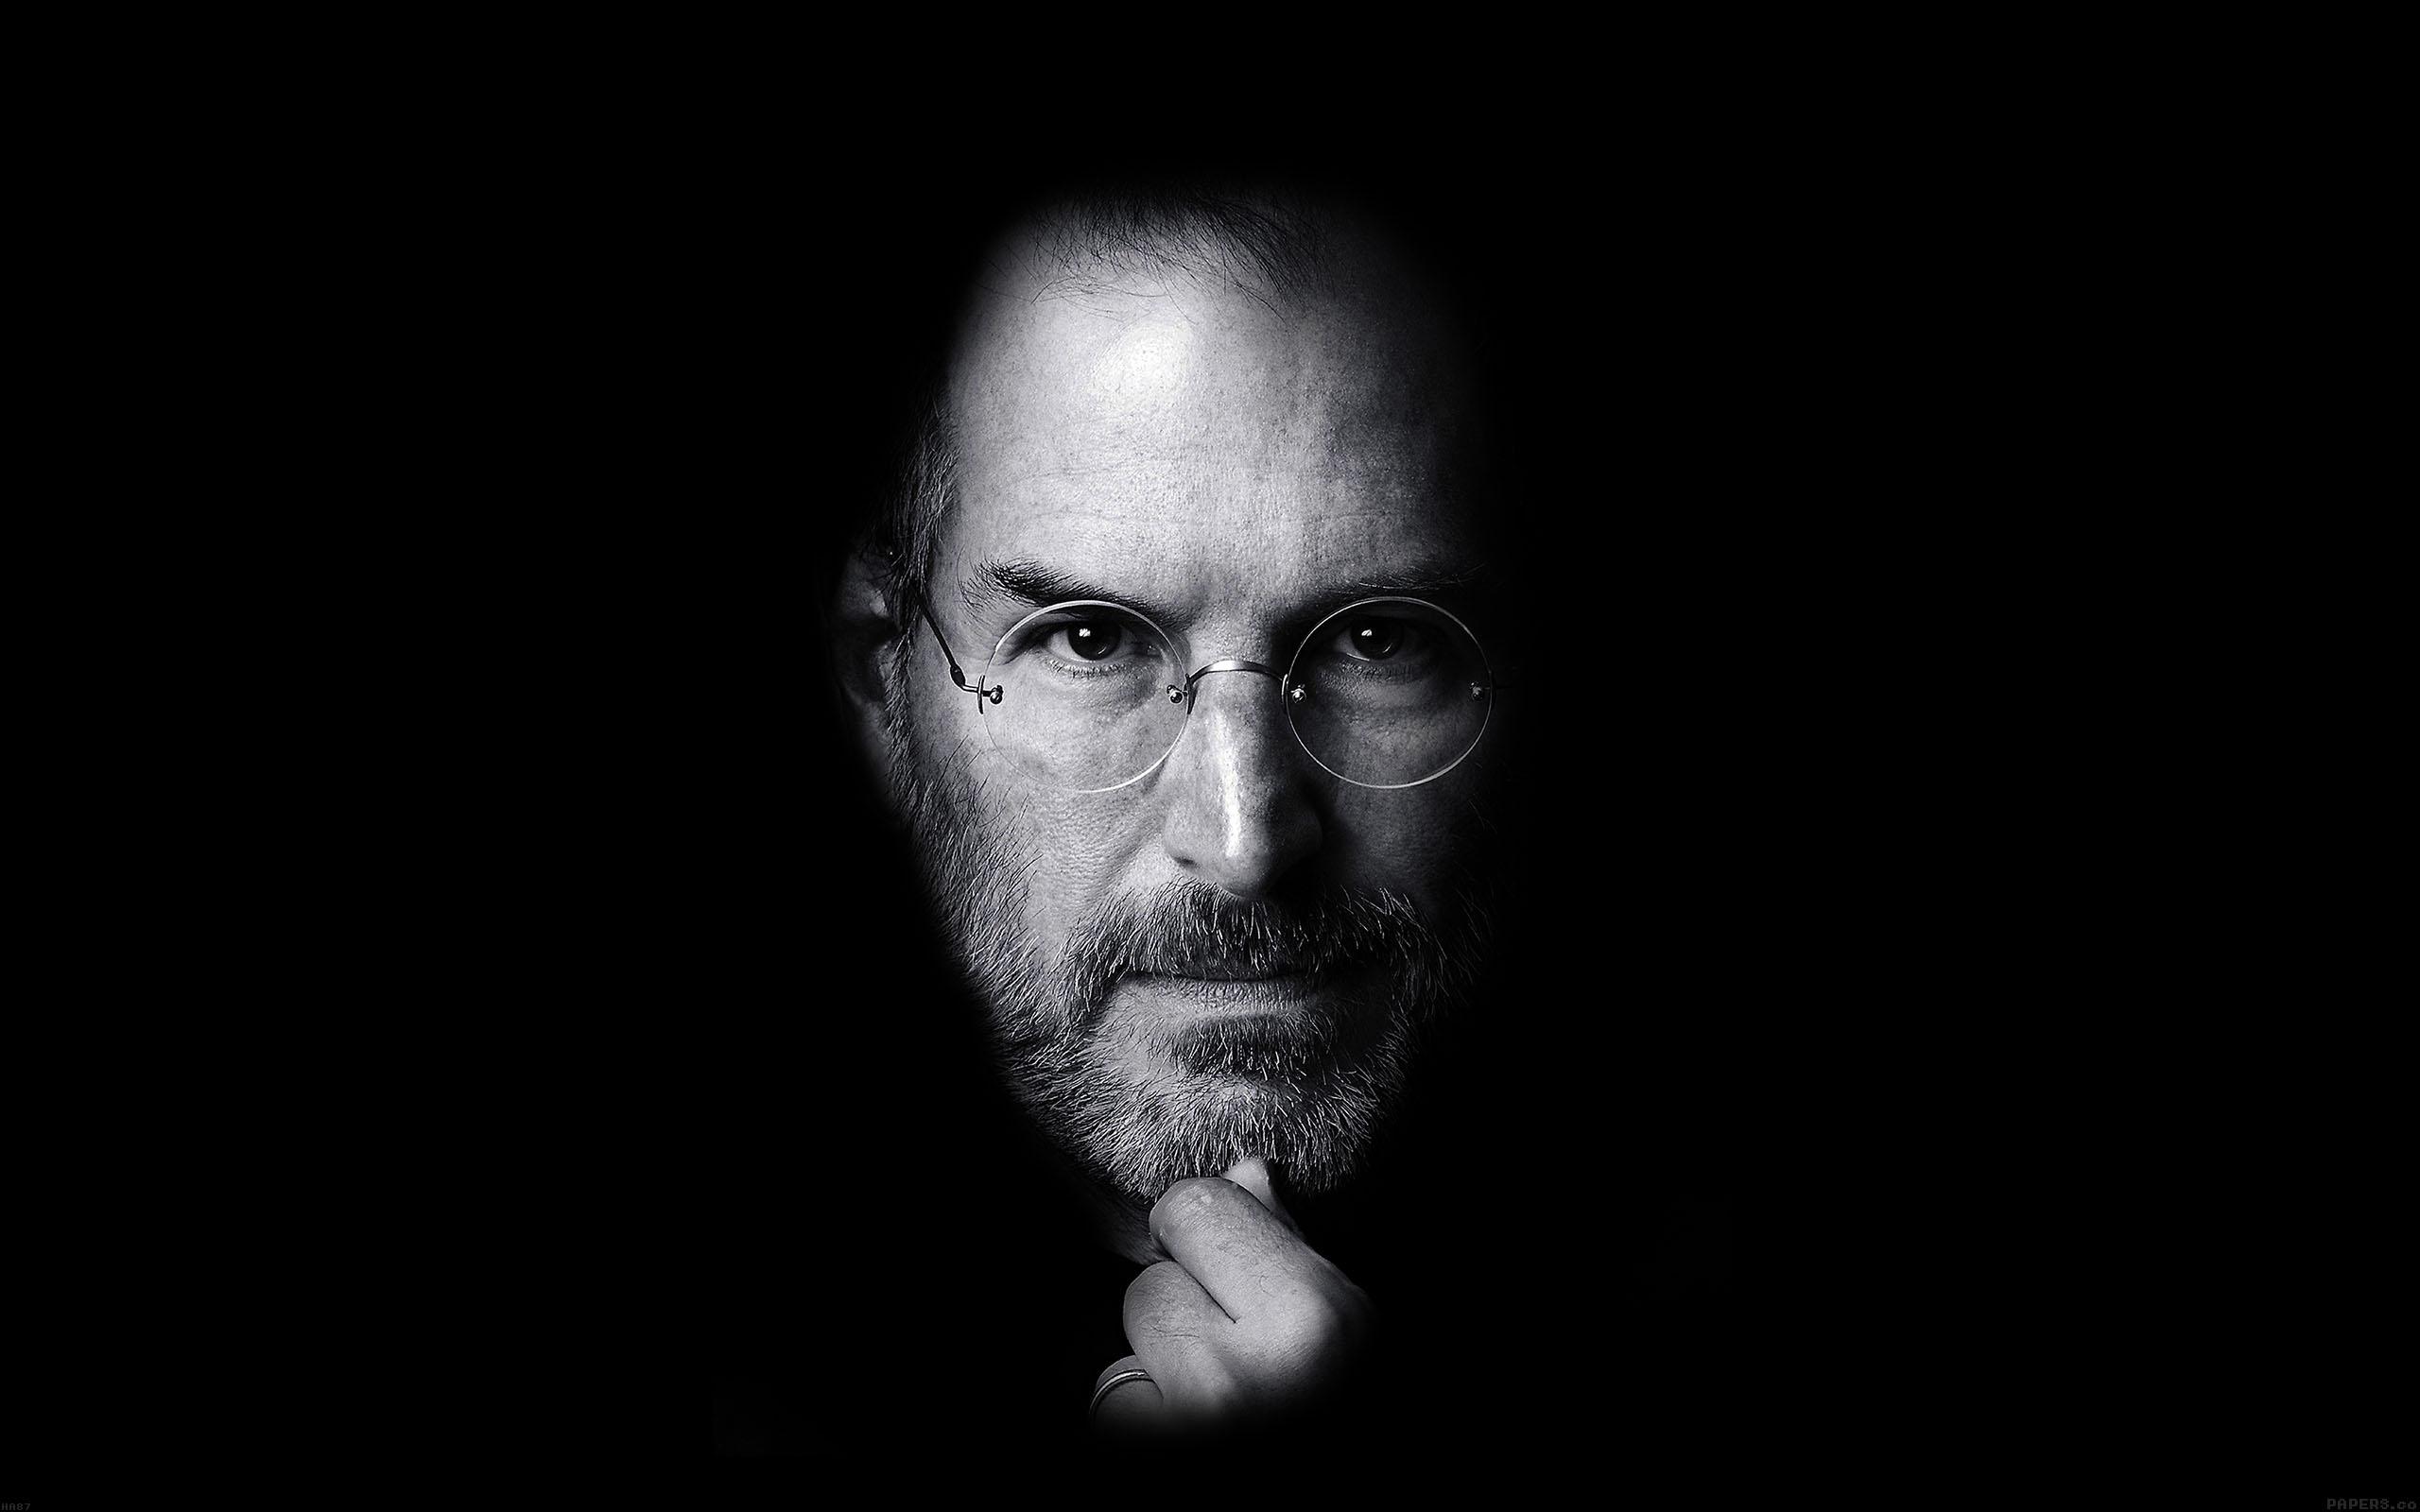 Animal Face Wallpaper Ha87 Wallpaper Steve Jobs Face Apple Papers Co